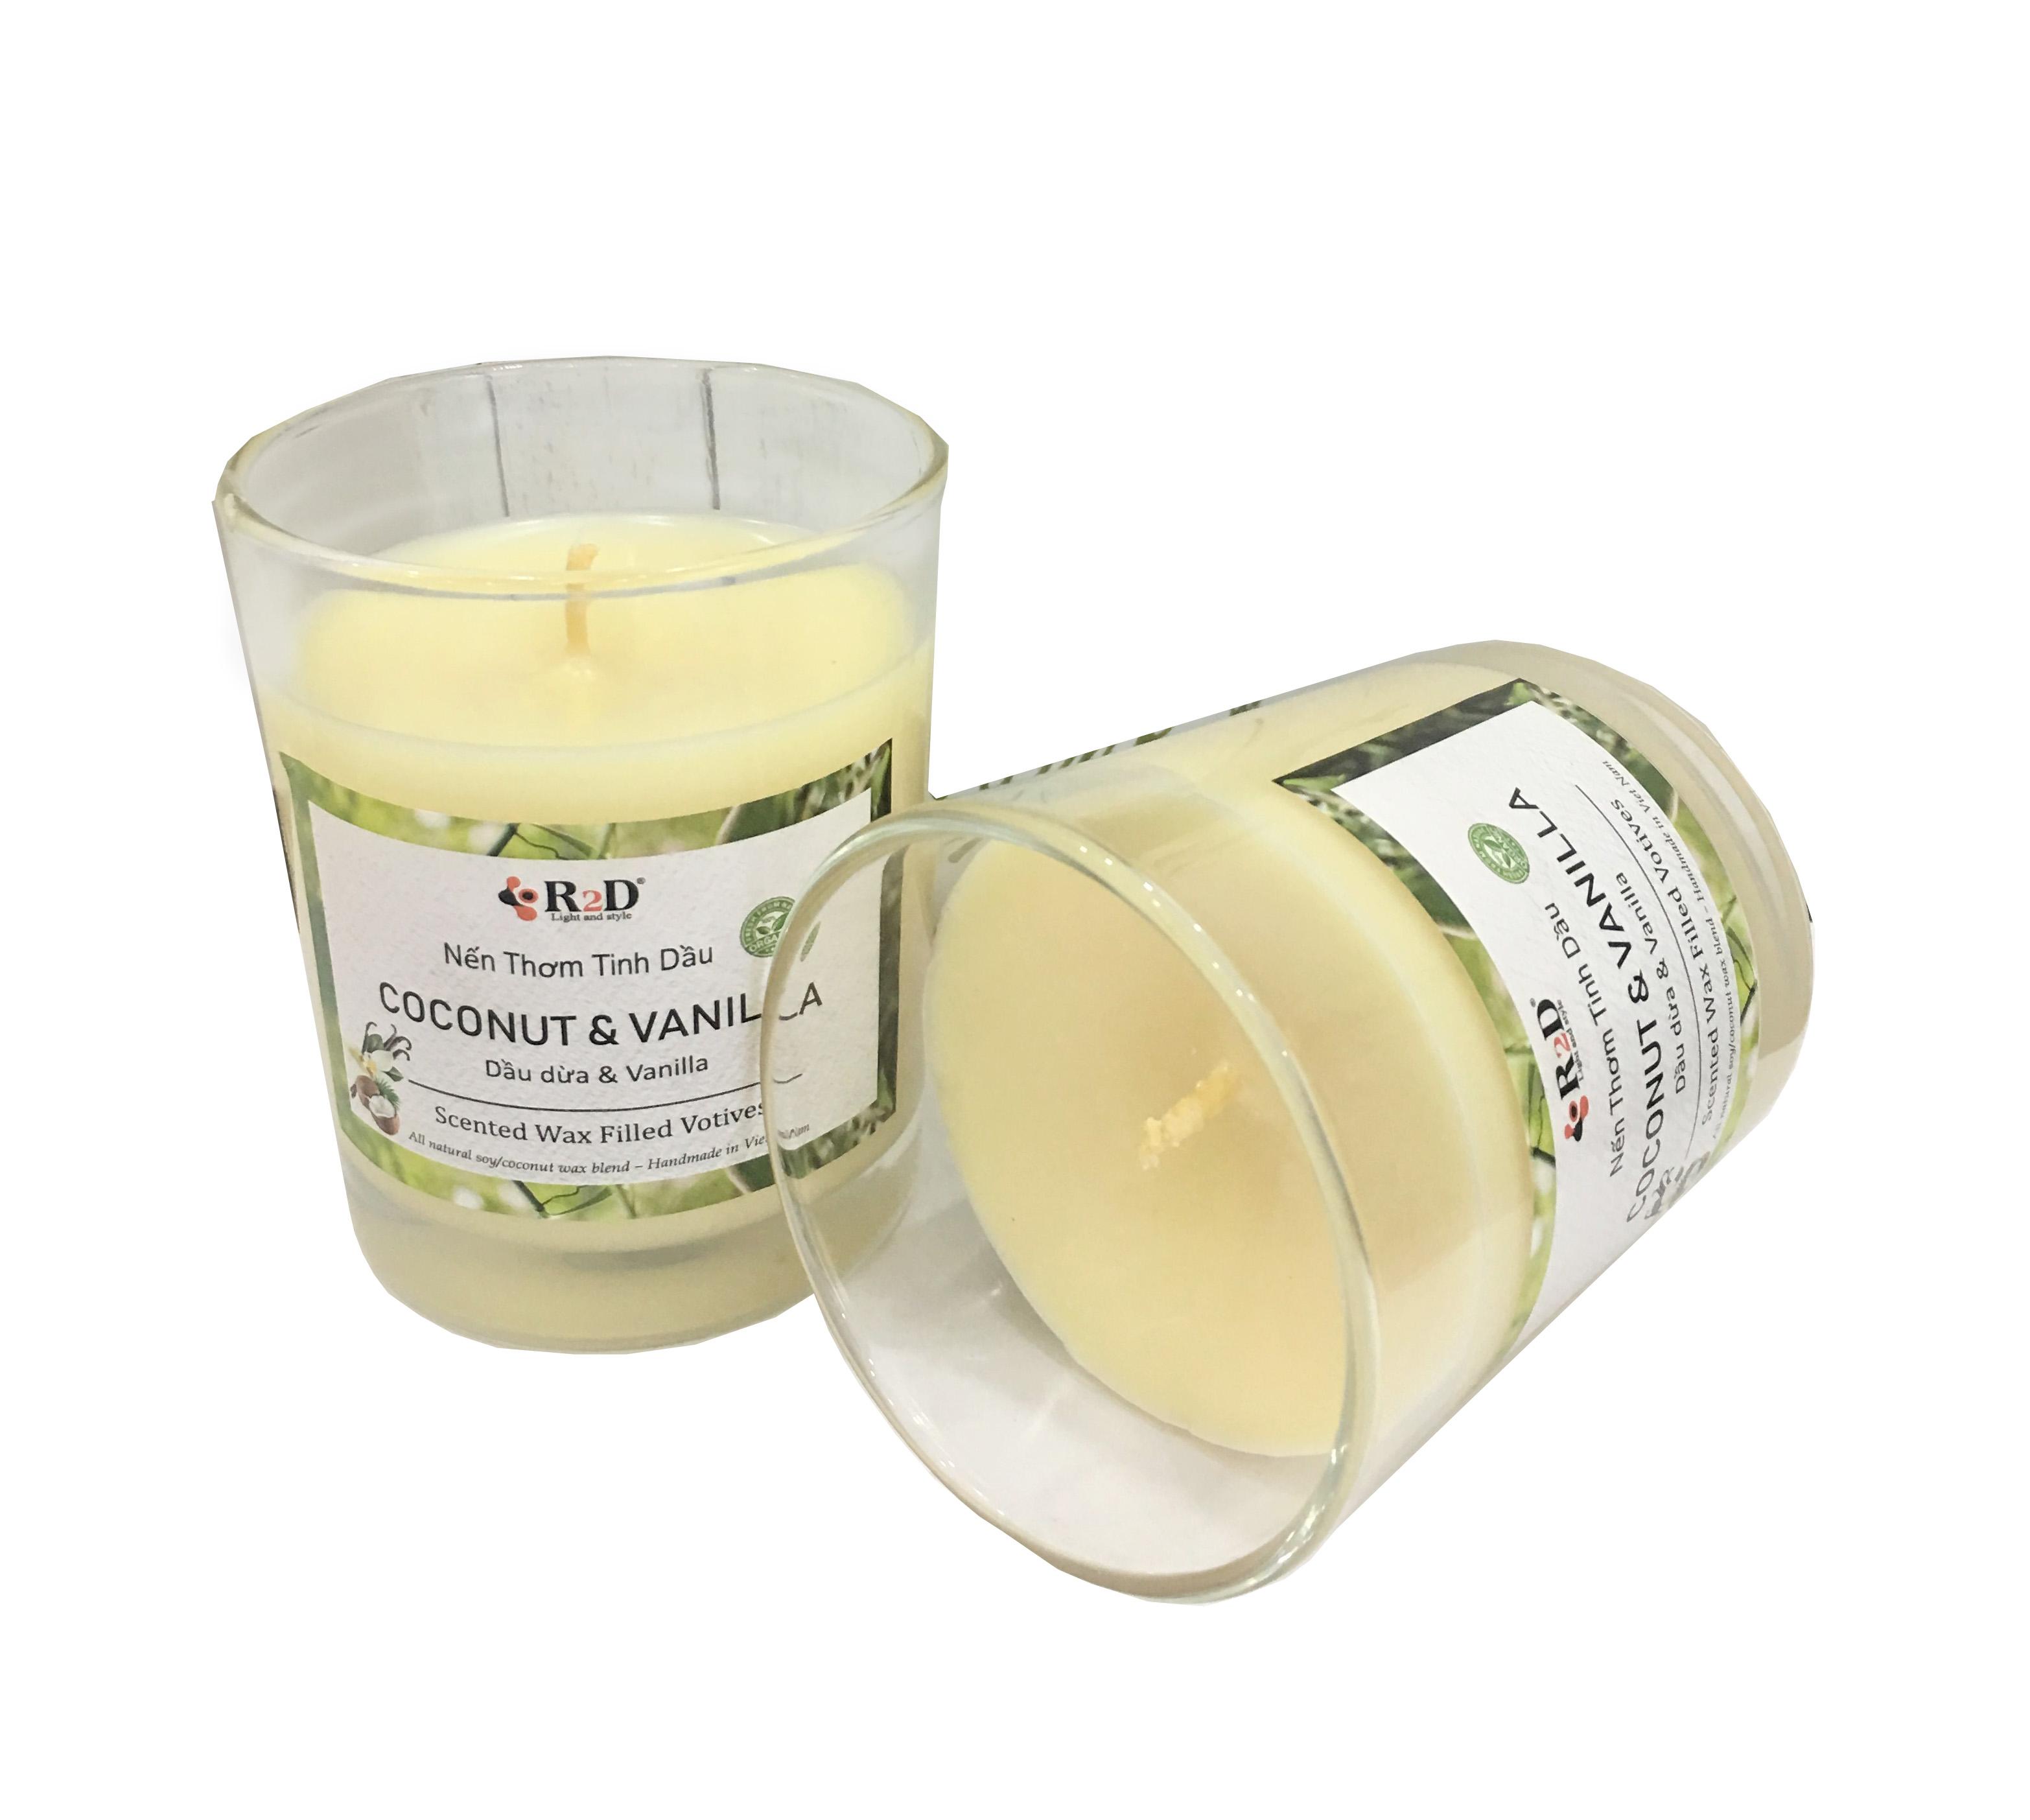 2 Ly Nến Thơm Tinh Dầu Dừa - Vanilla